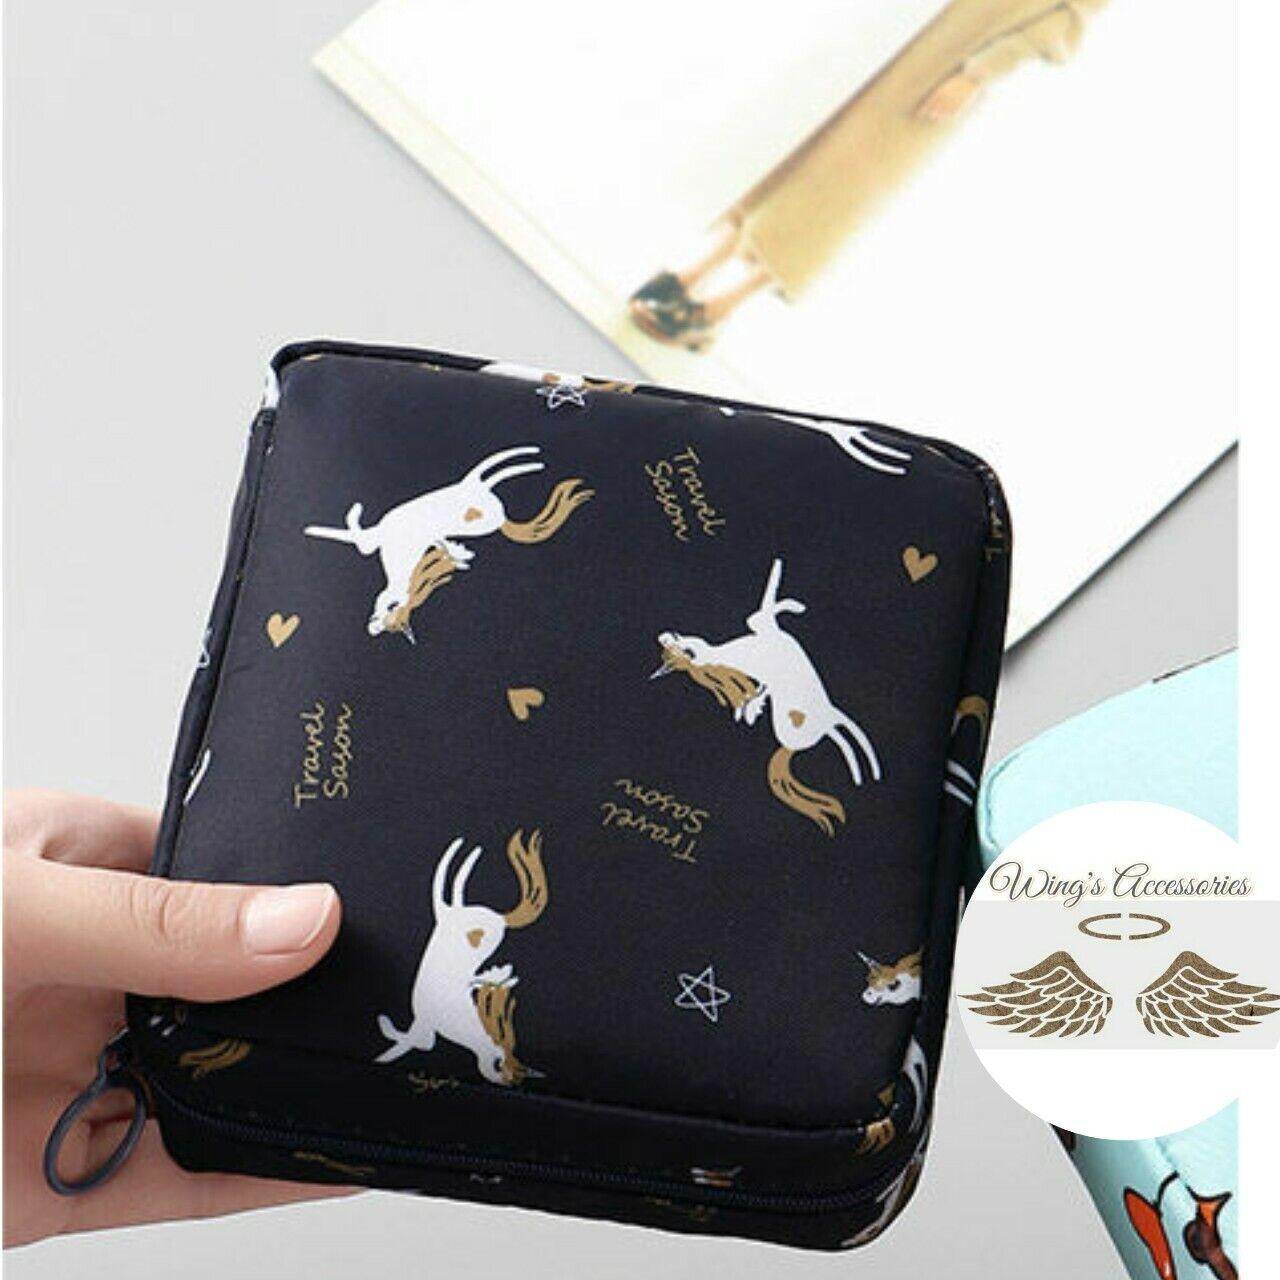 (New) Adorable Korean style unicorn light waterproof multi use pouch/organizer